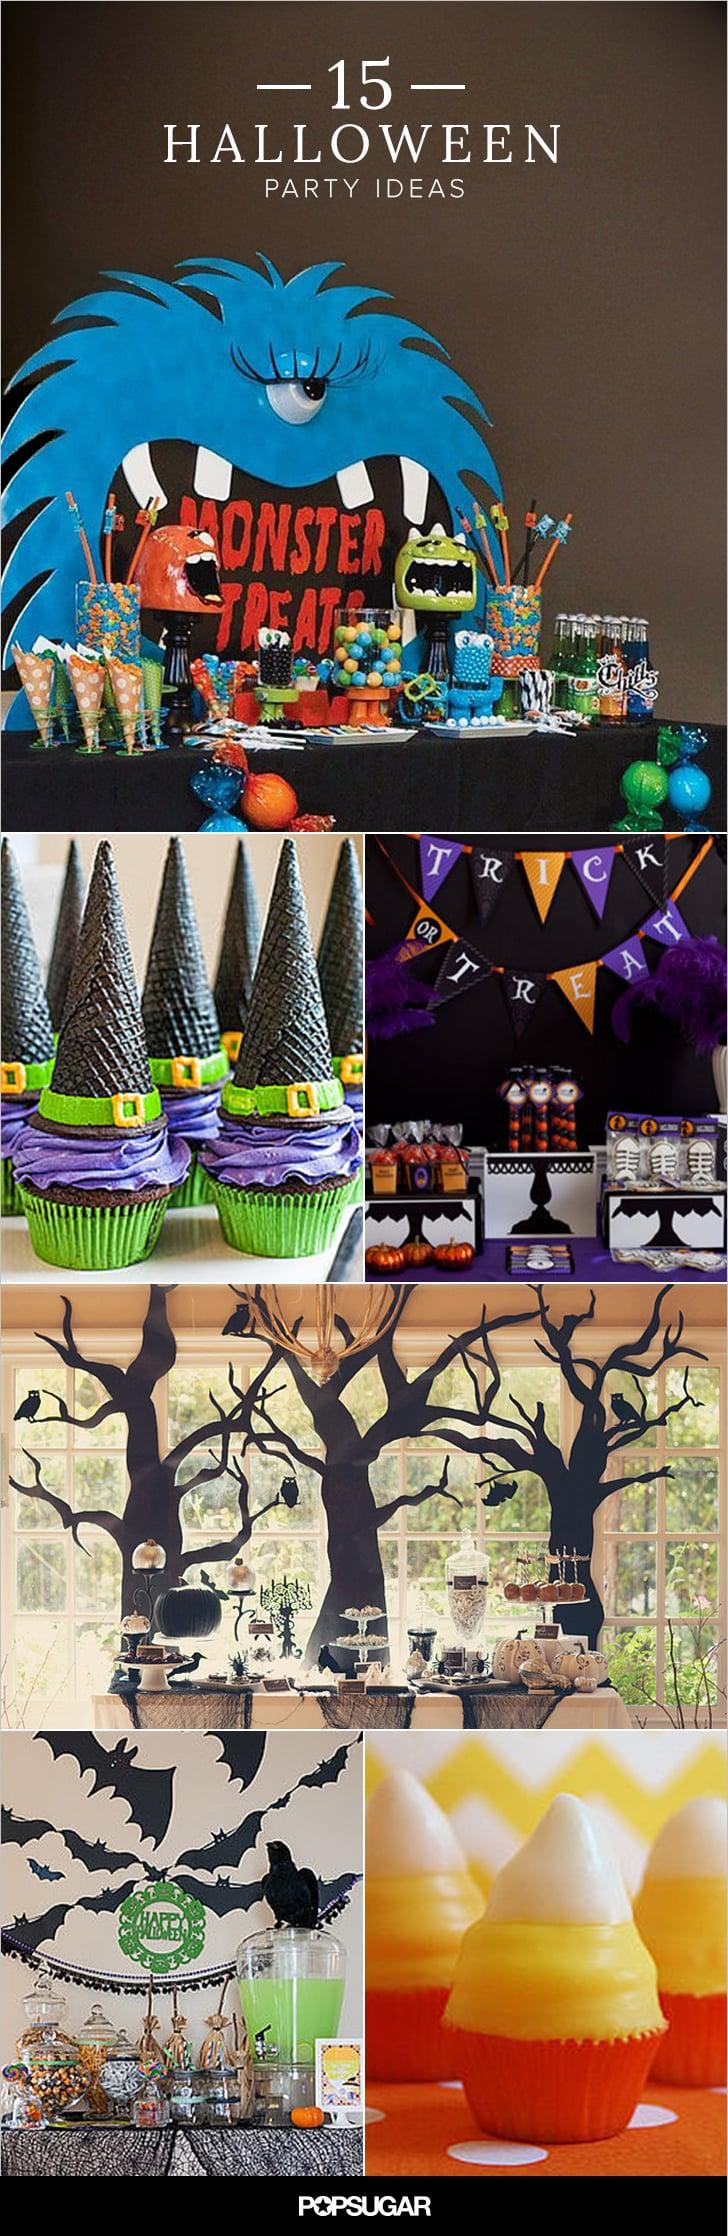 kid friendly halloween party ideas popsugar moms photo 16. Black Bedroom Furniture Sets. Home Design Ideas